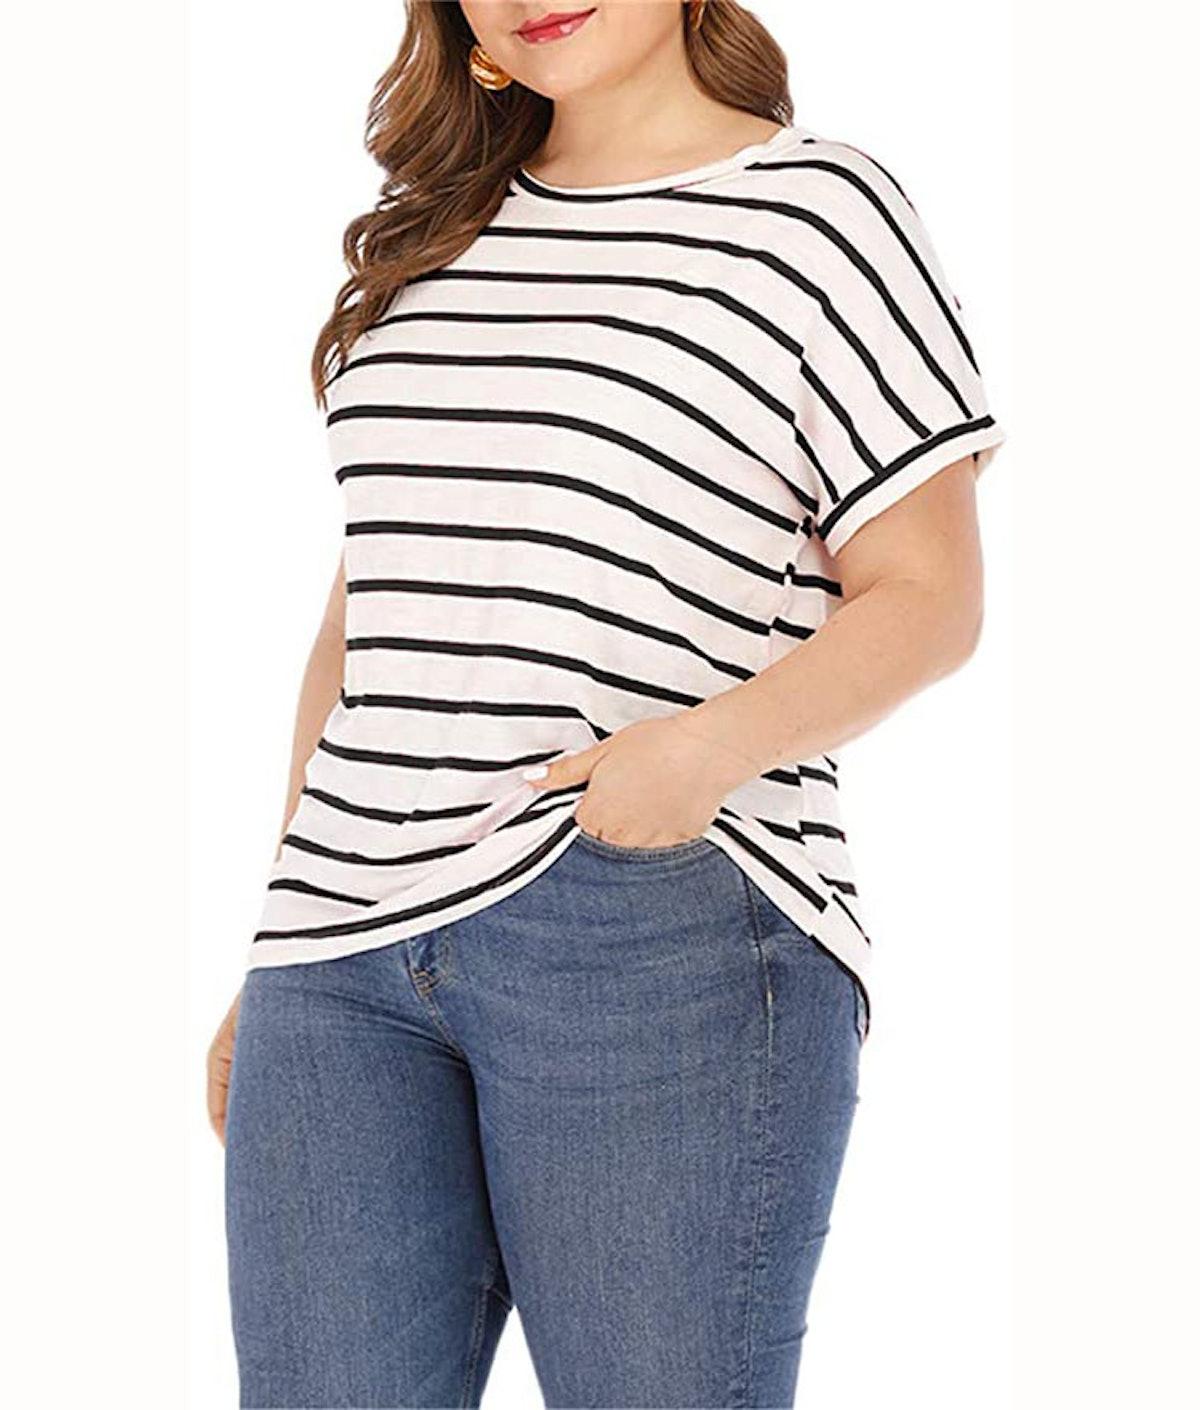 GXLU Plus Size Short Sleeve Striped T Shirt